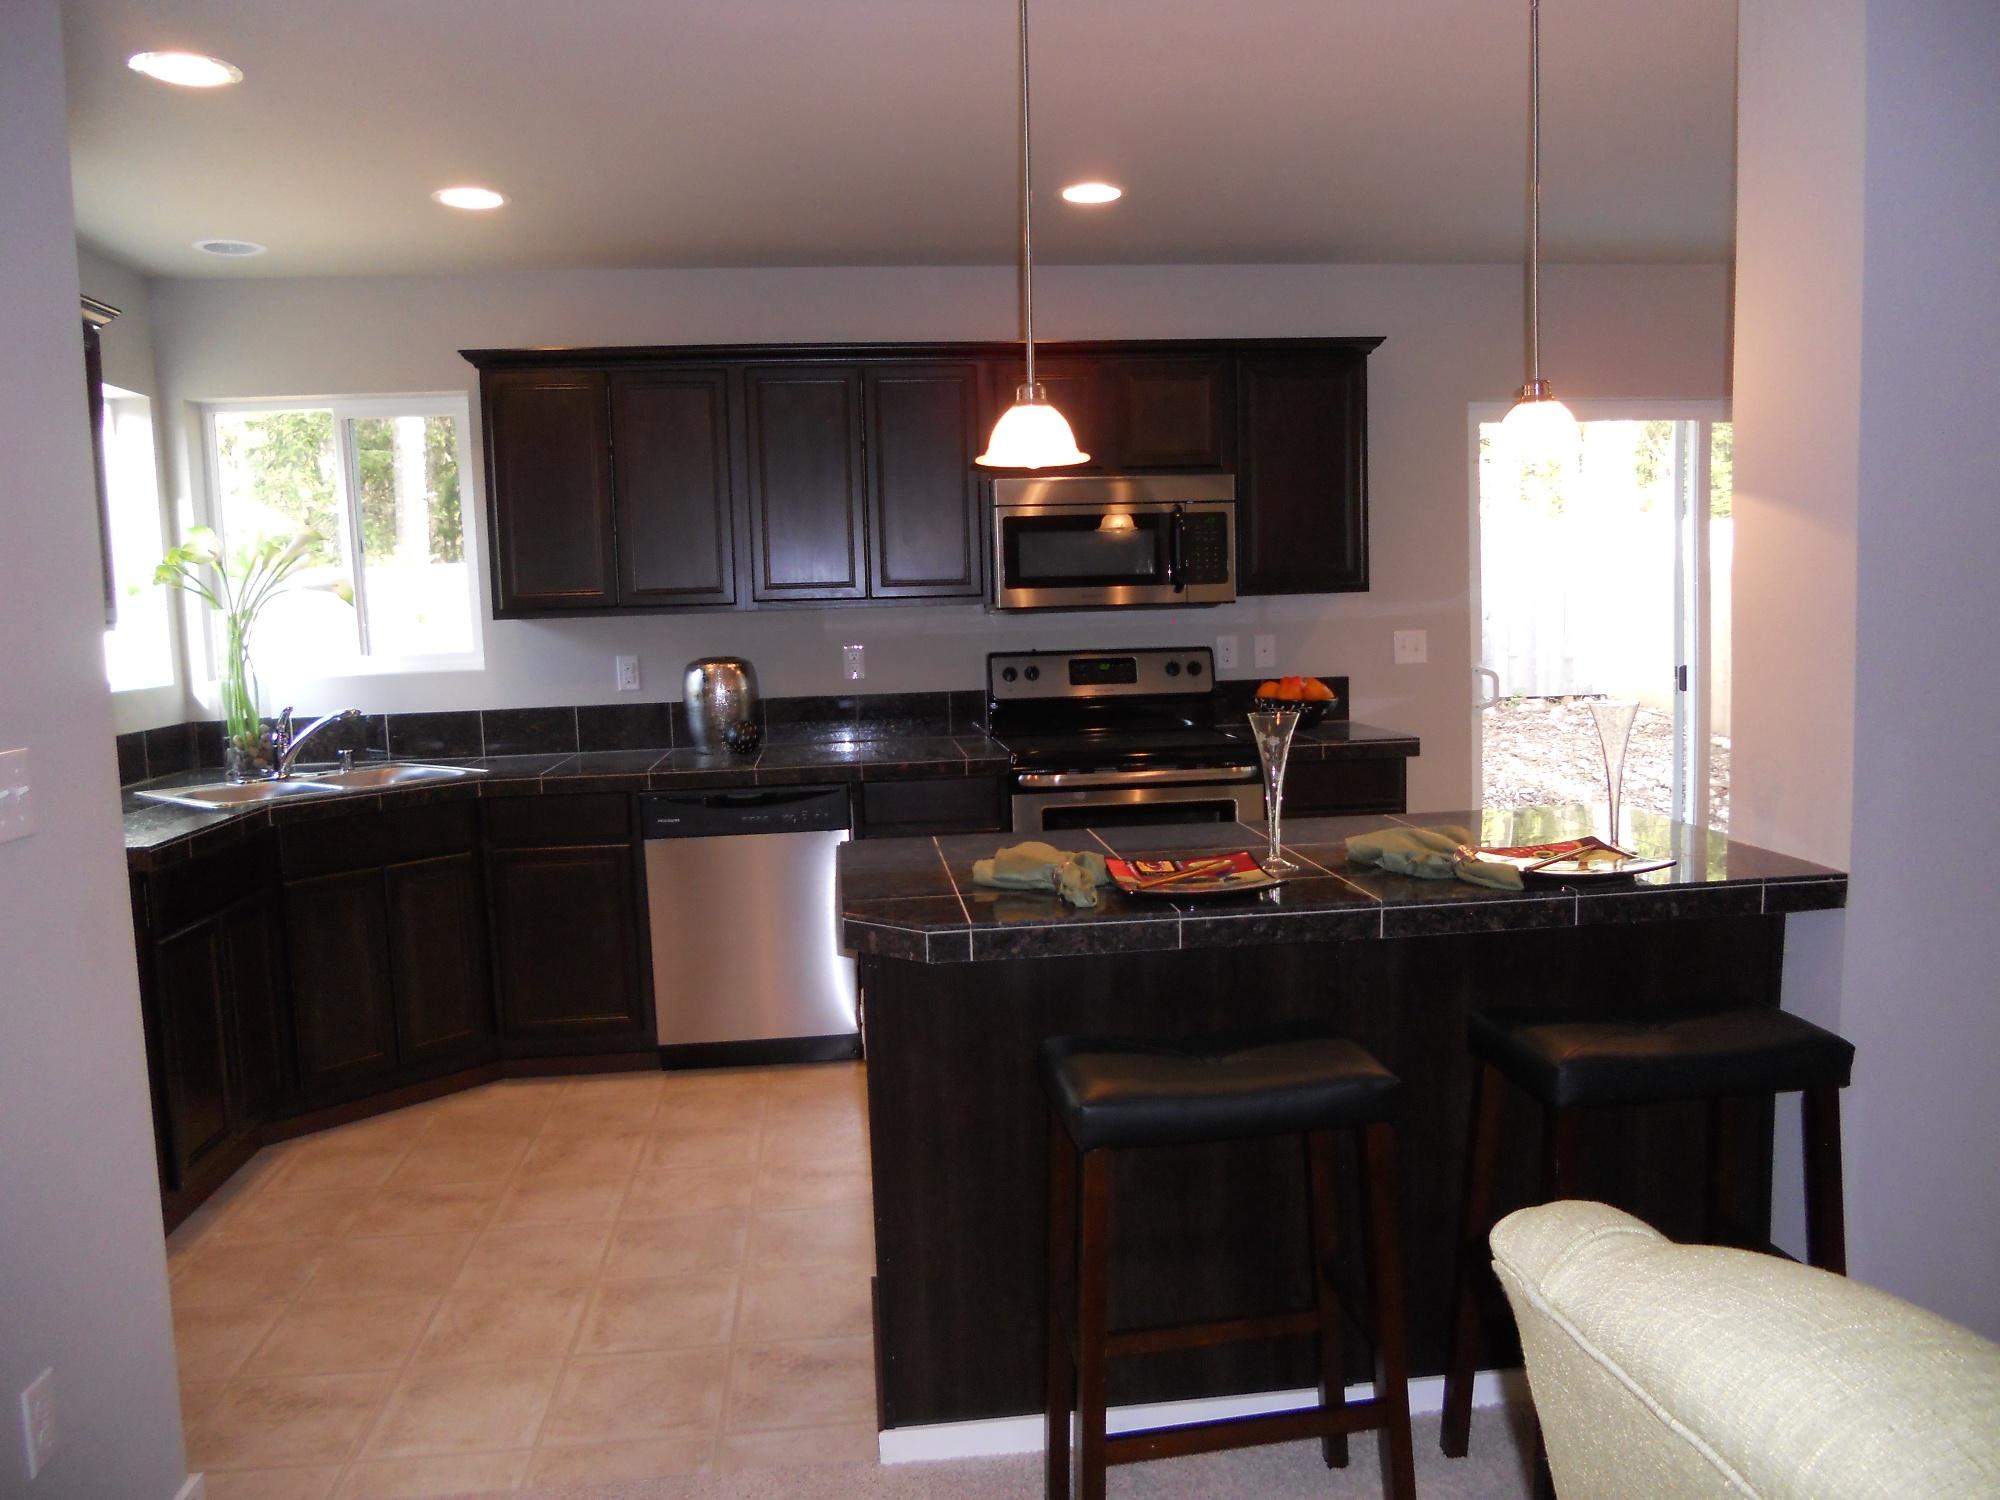 Model Home New Kitchen Design | Regent Homes on Model Kitchen  id=32471